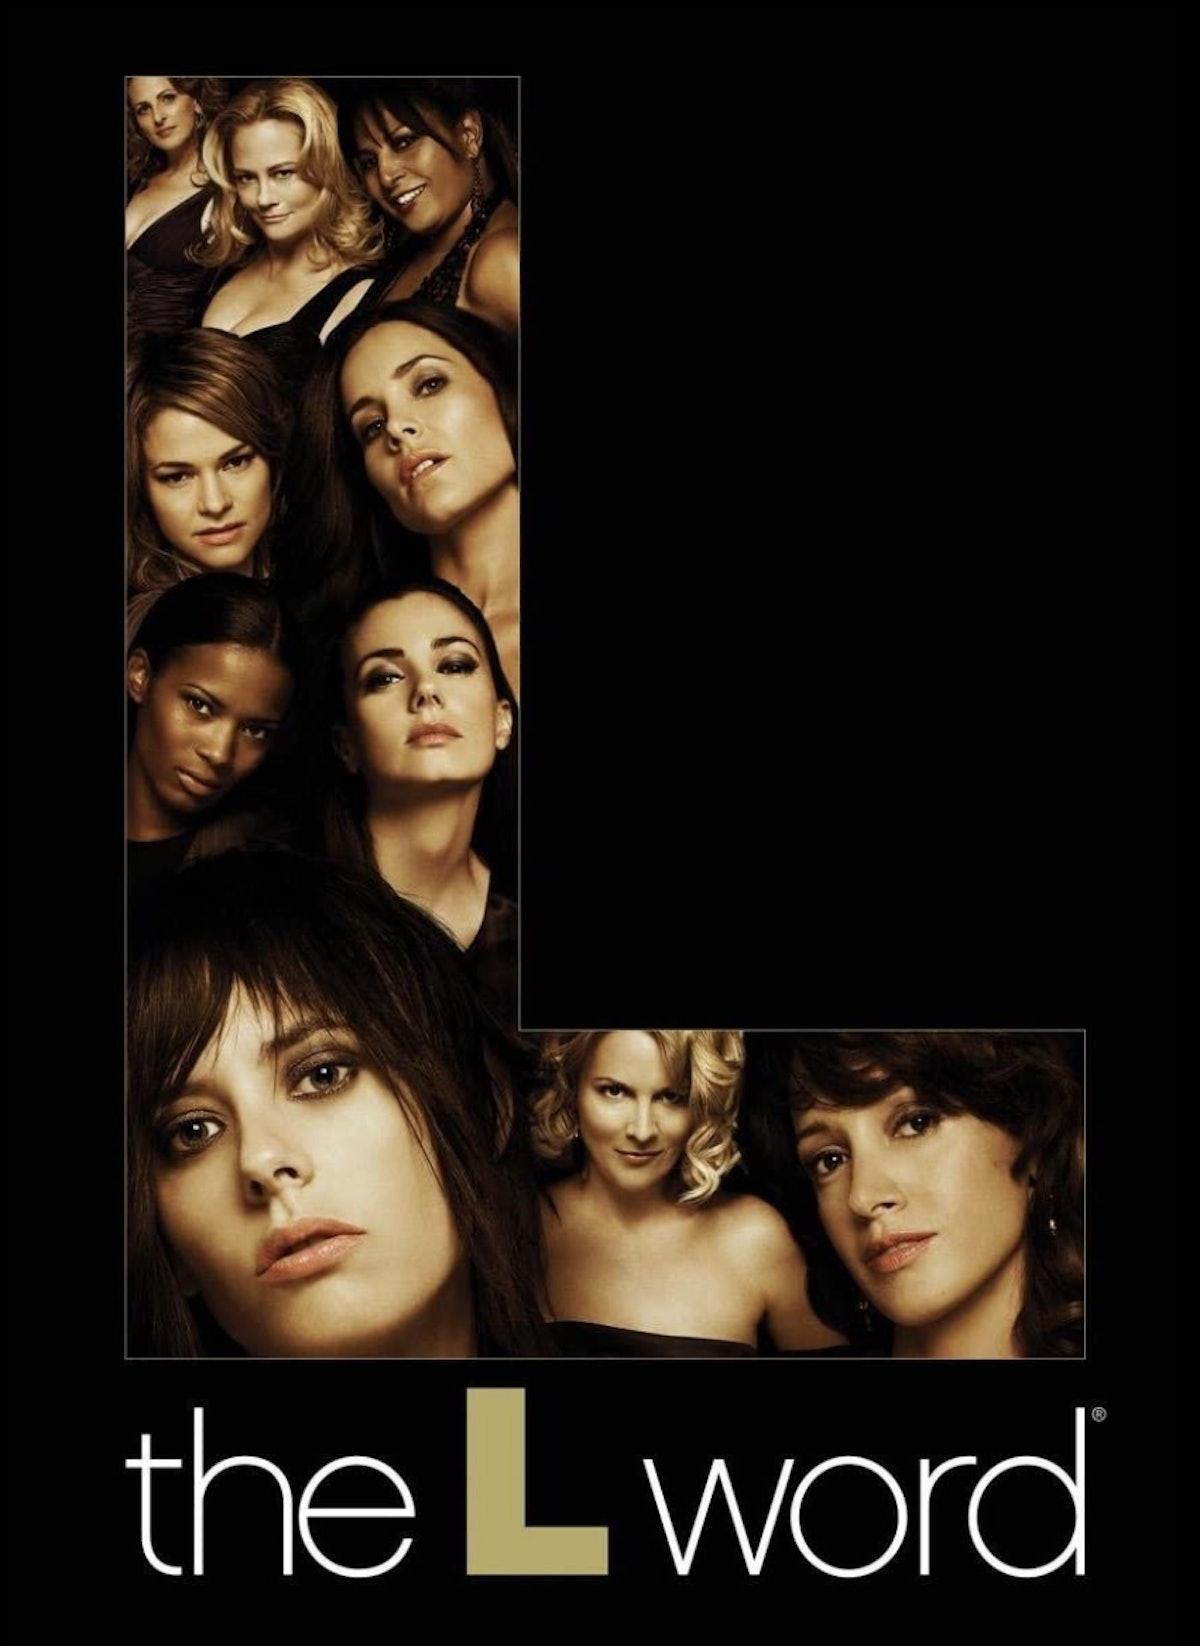 The L Word season 1 poster